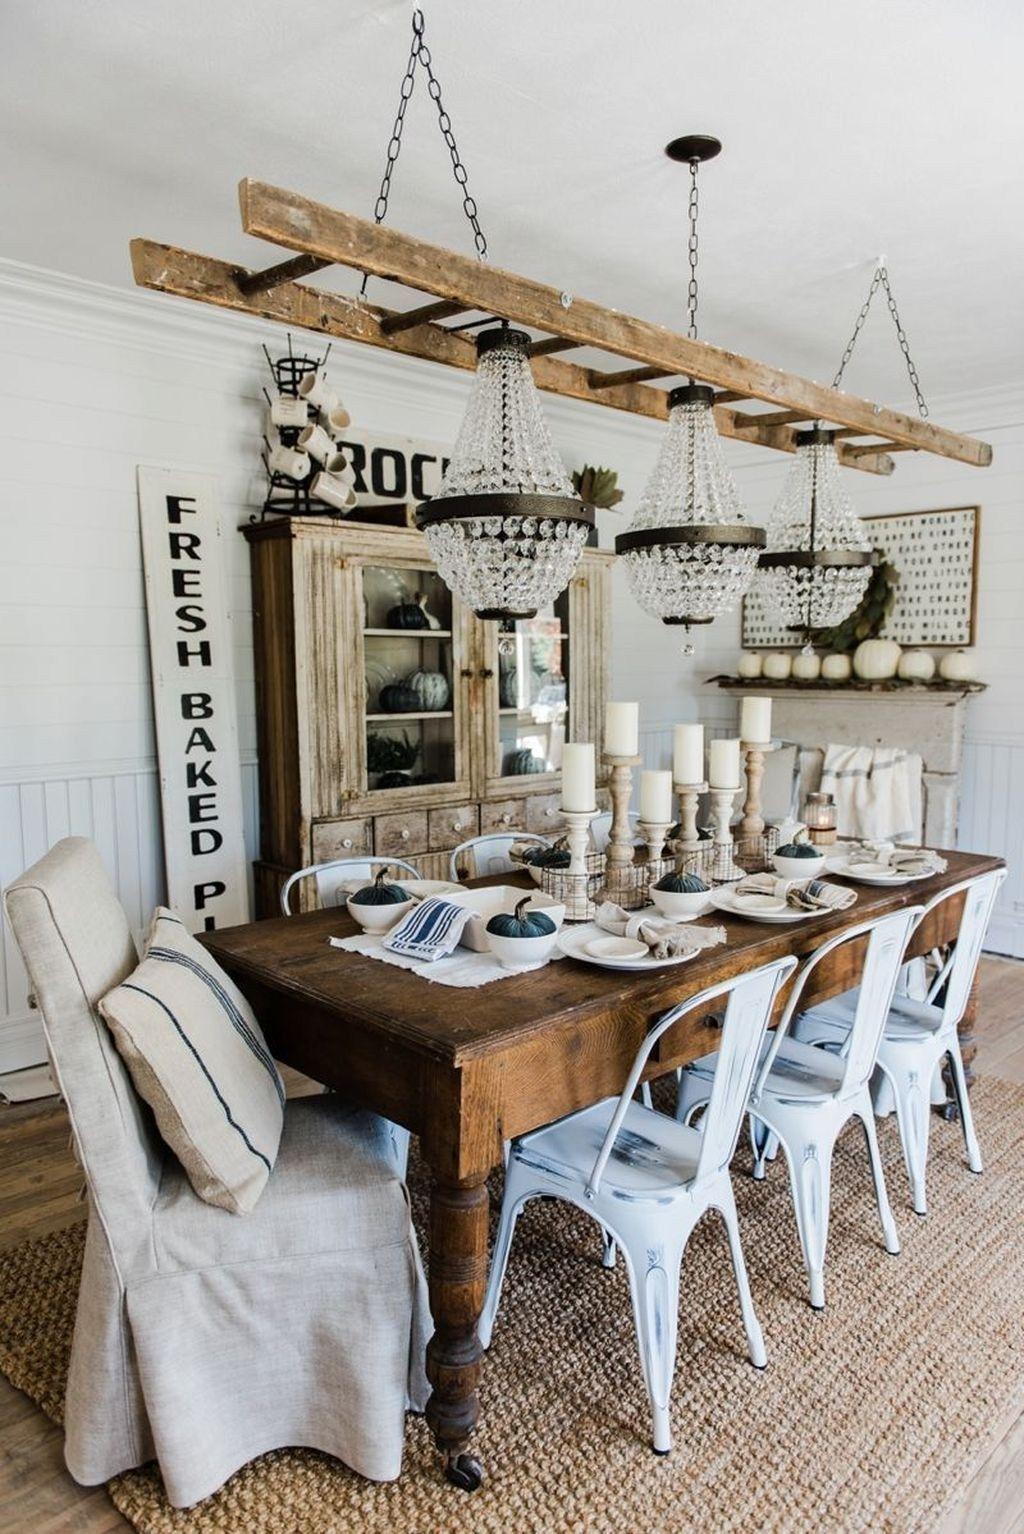 7 Farmhouse Dining Room Lighting Rustic In 2020 Modern Farmhouse